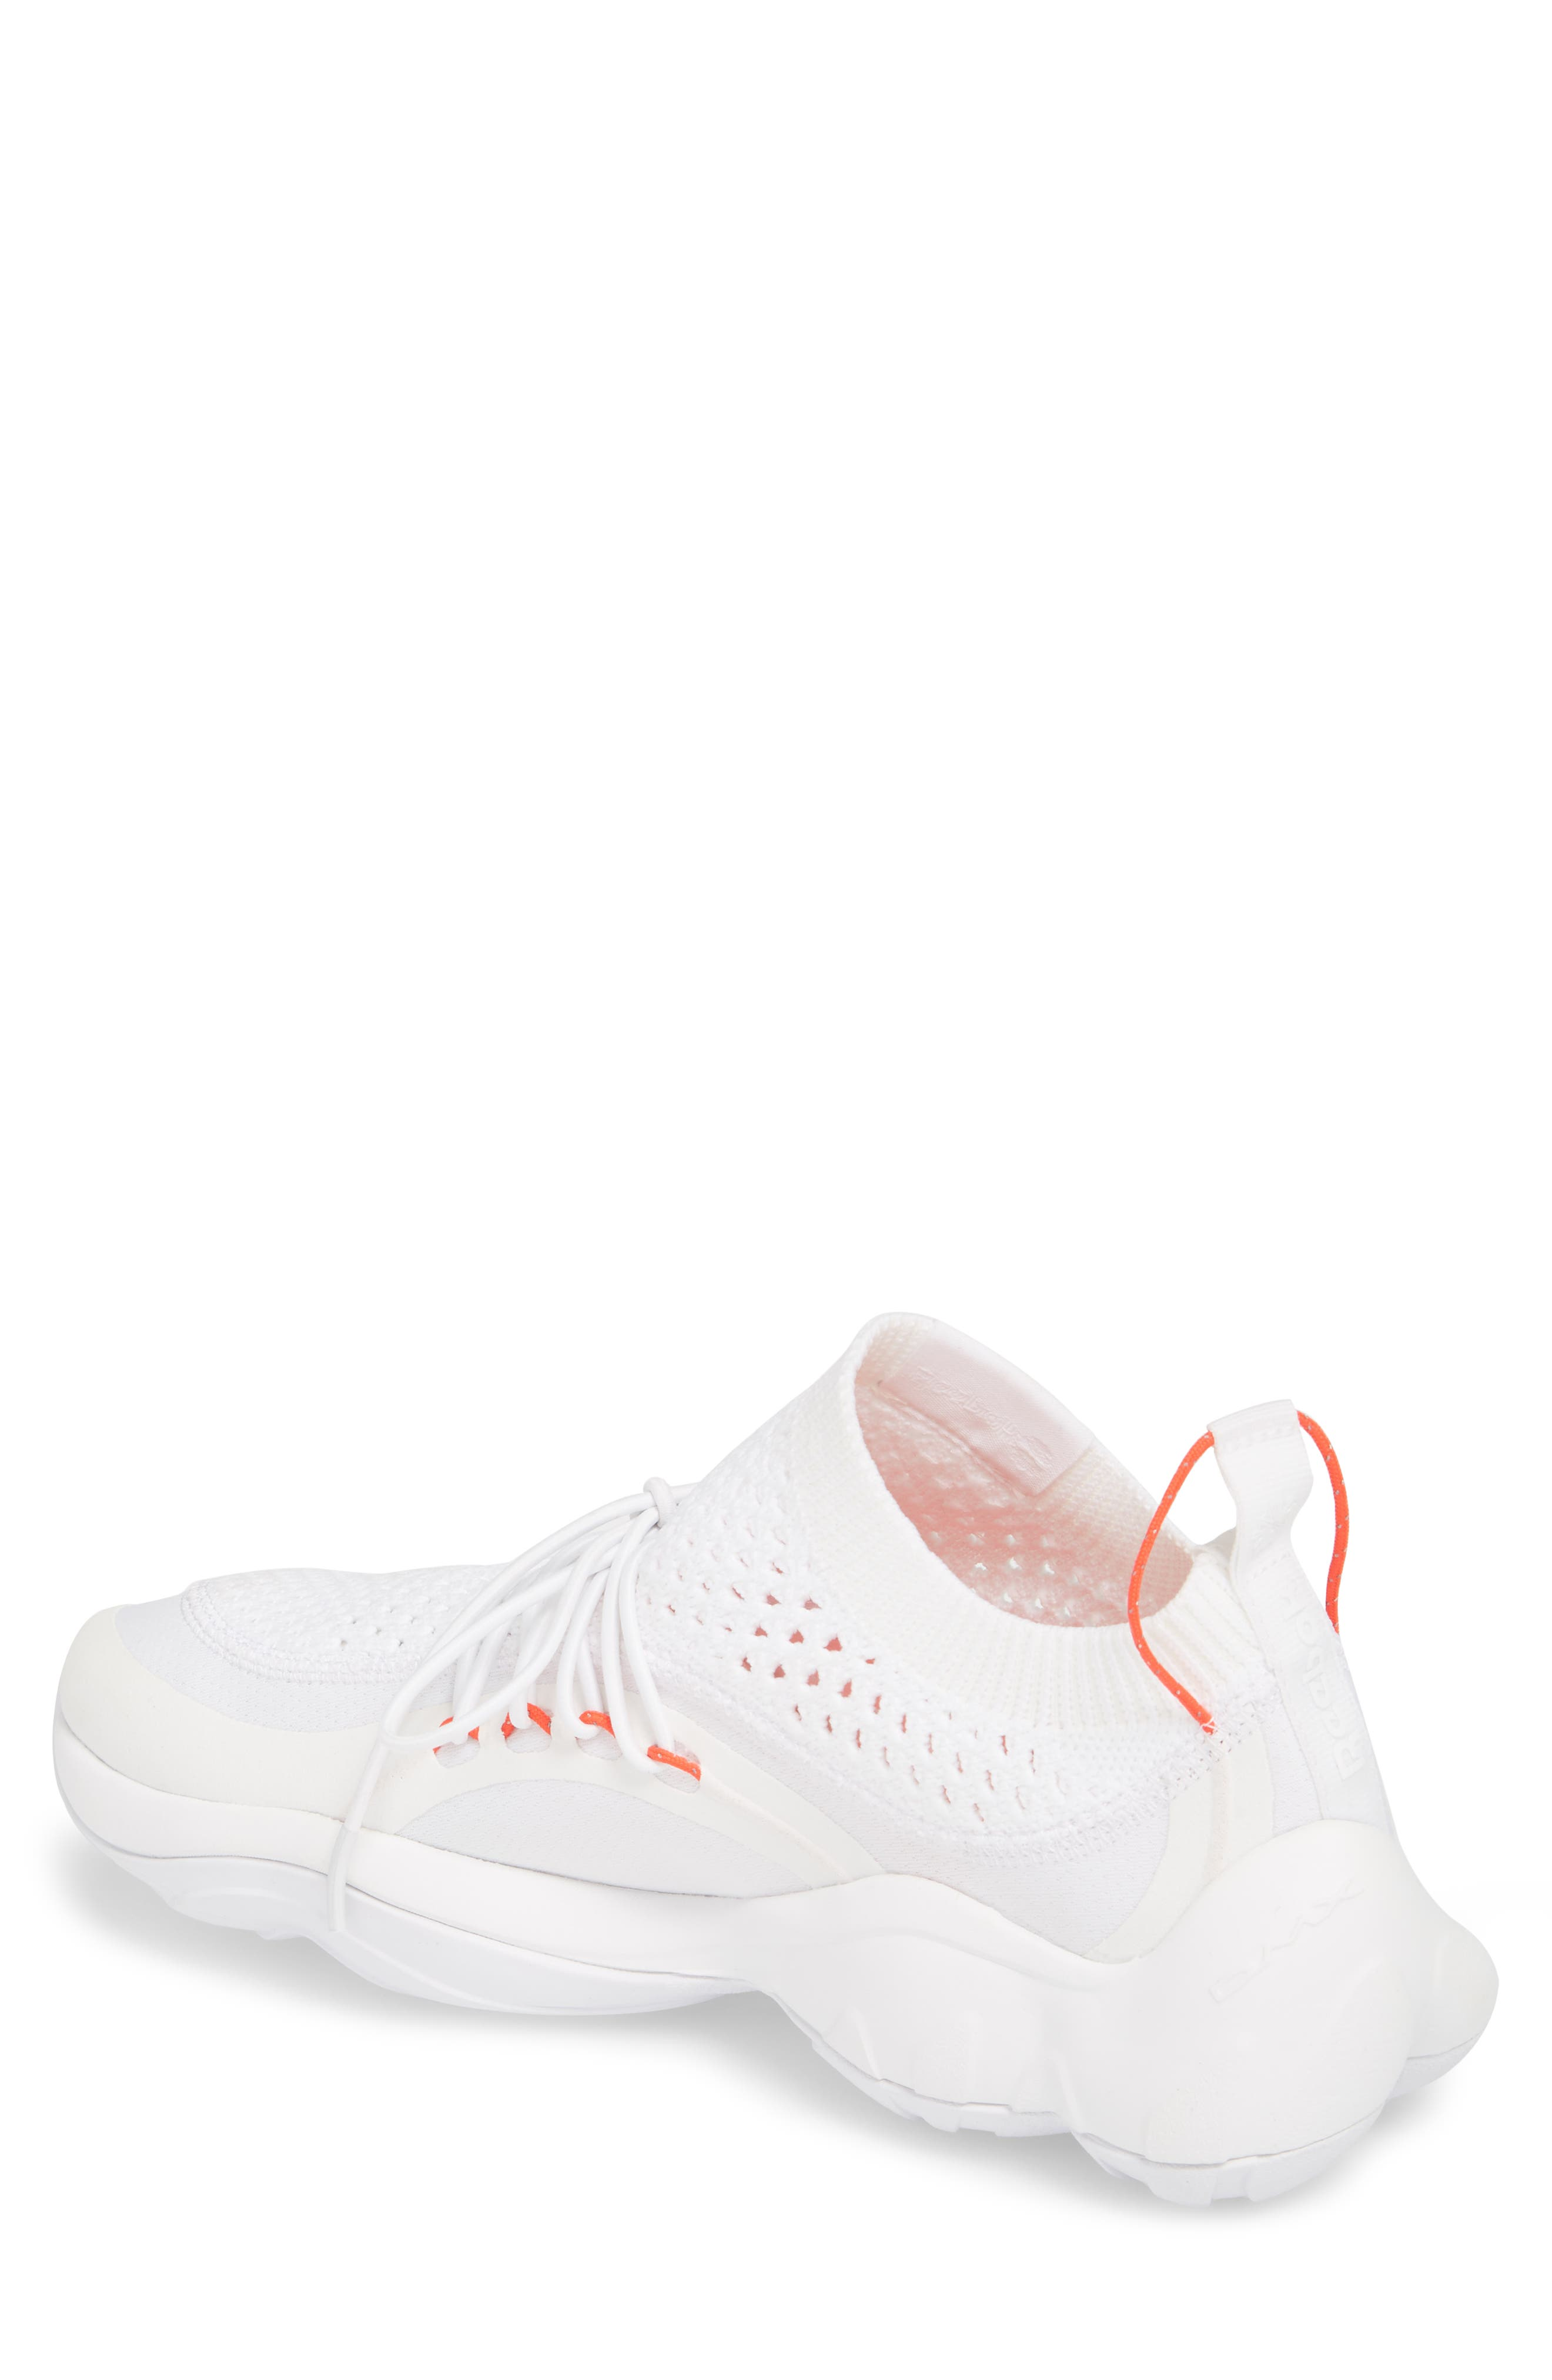 DMX Fusion NR Sneaker,                             Alternate thumbnail 2, color,                             WHITE/ BLACK/ NEON CHERRY